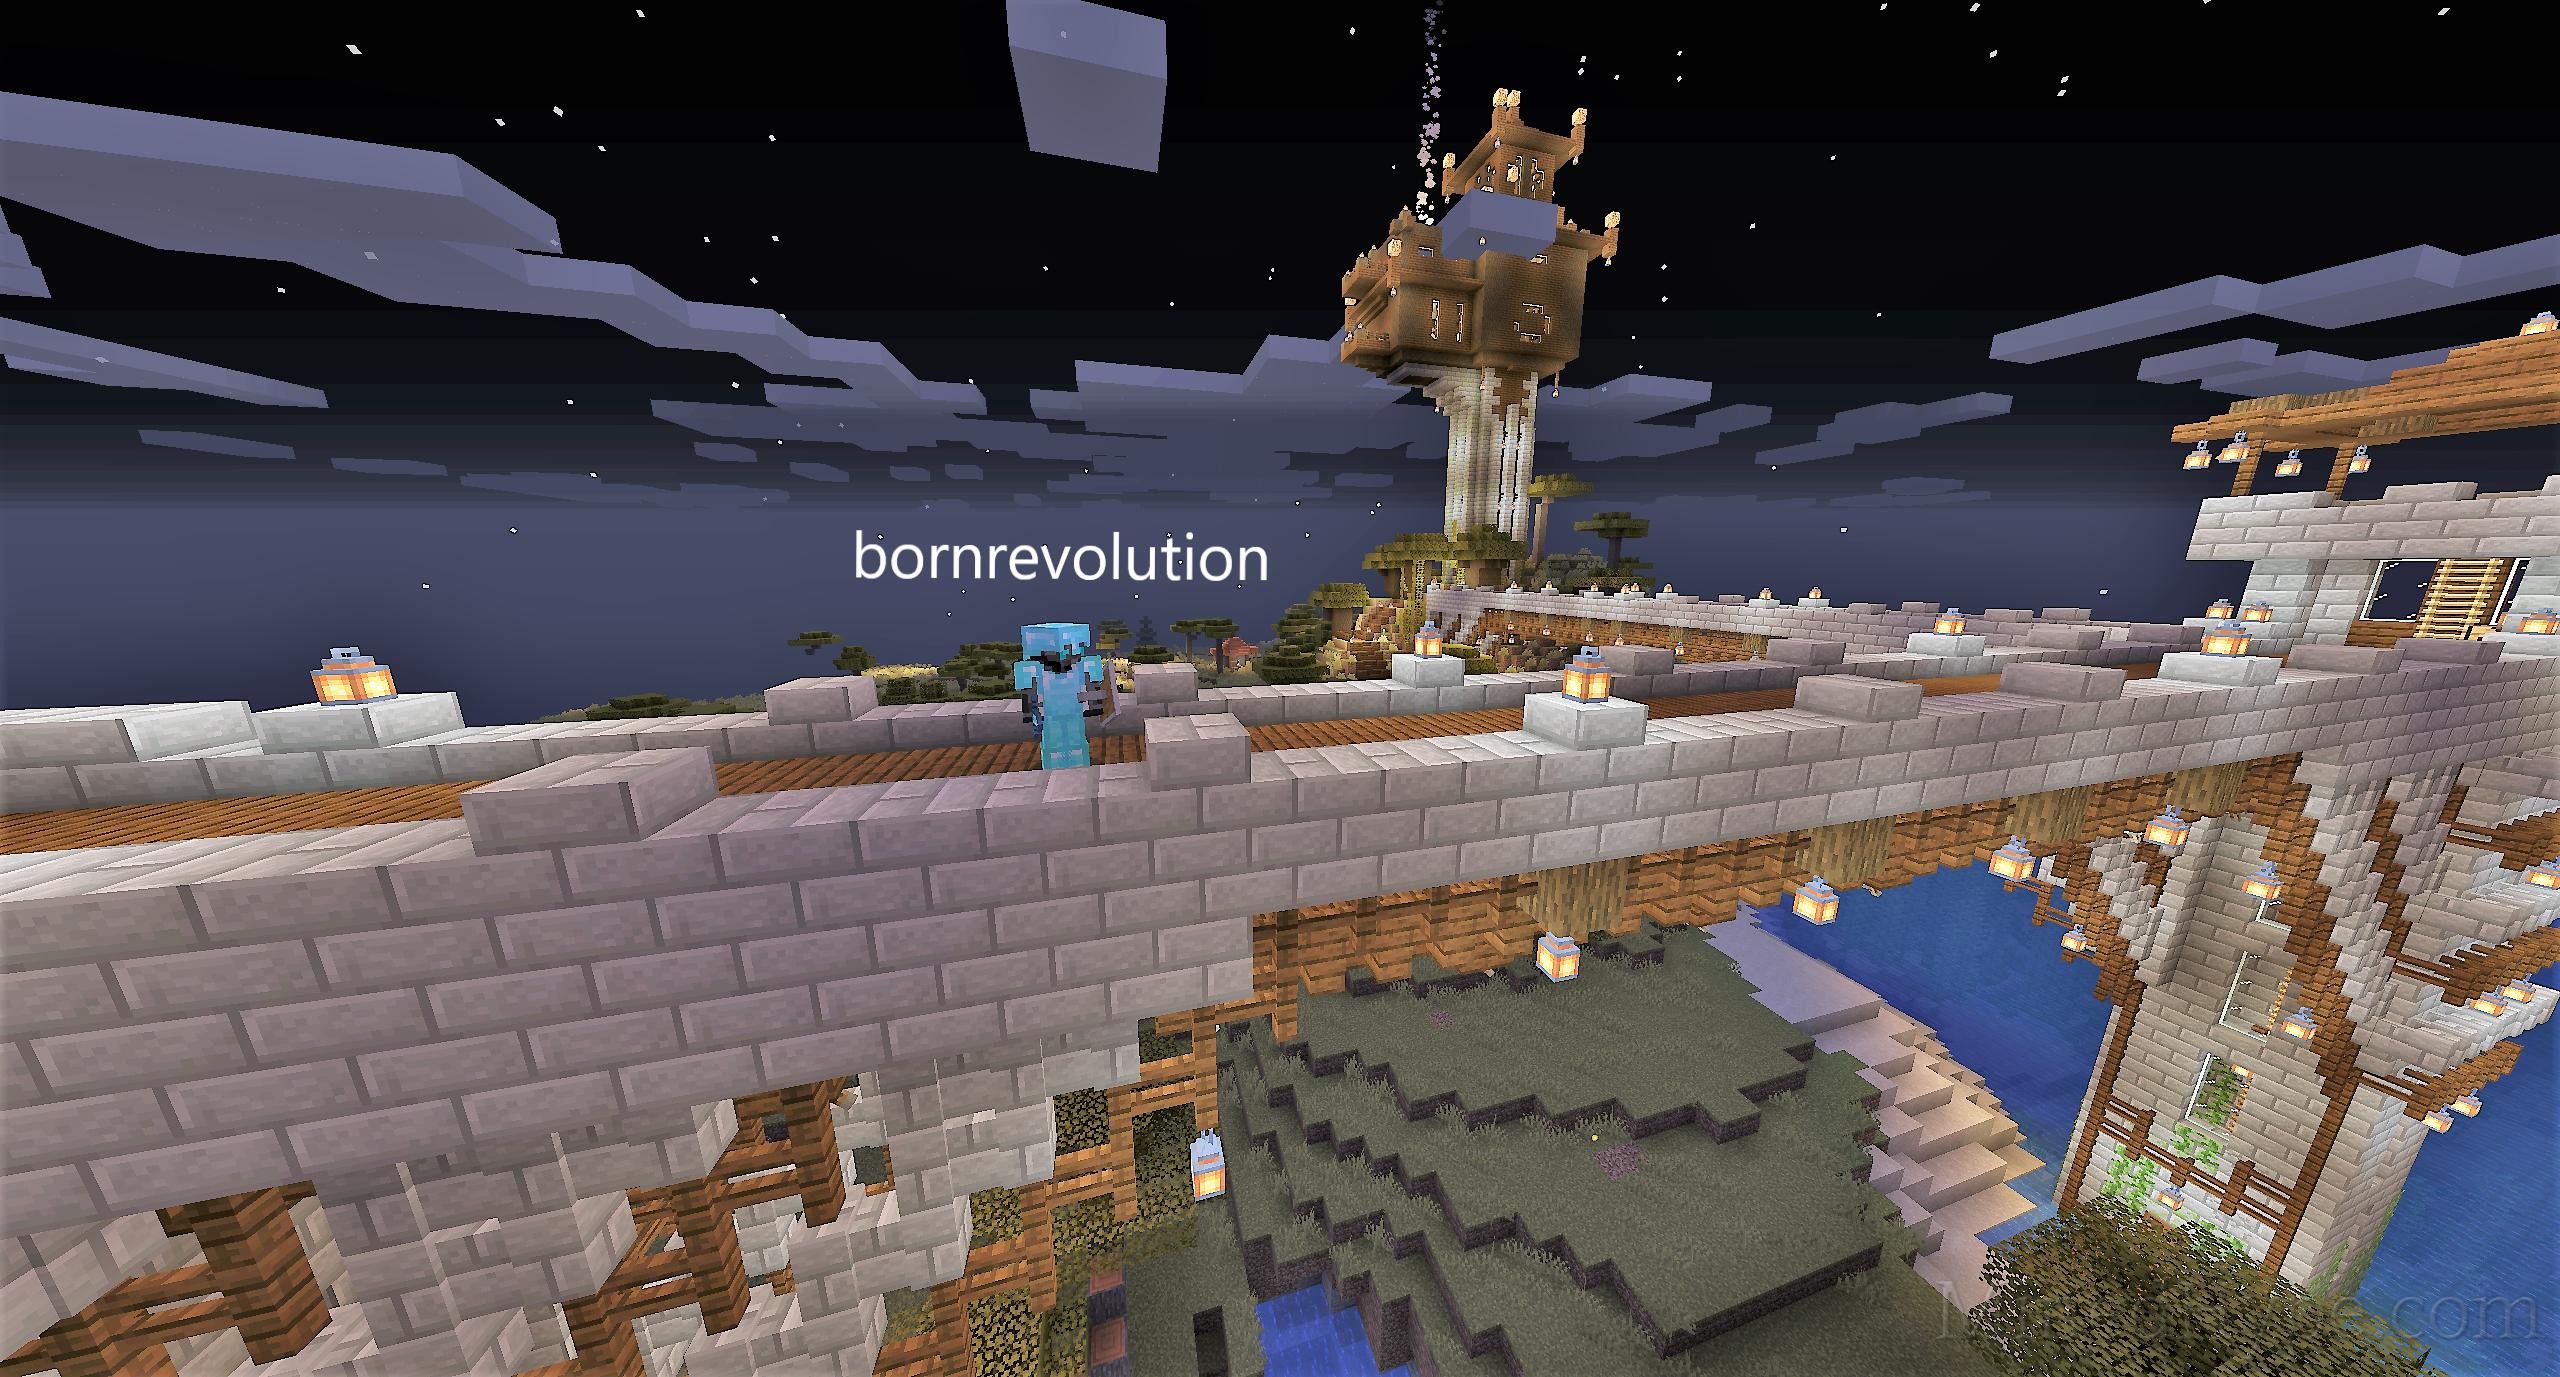 bornrevolution